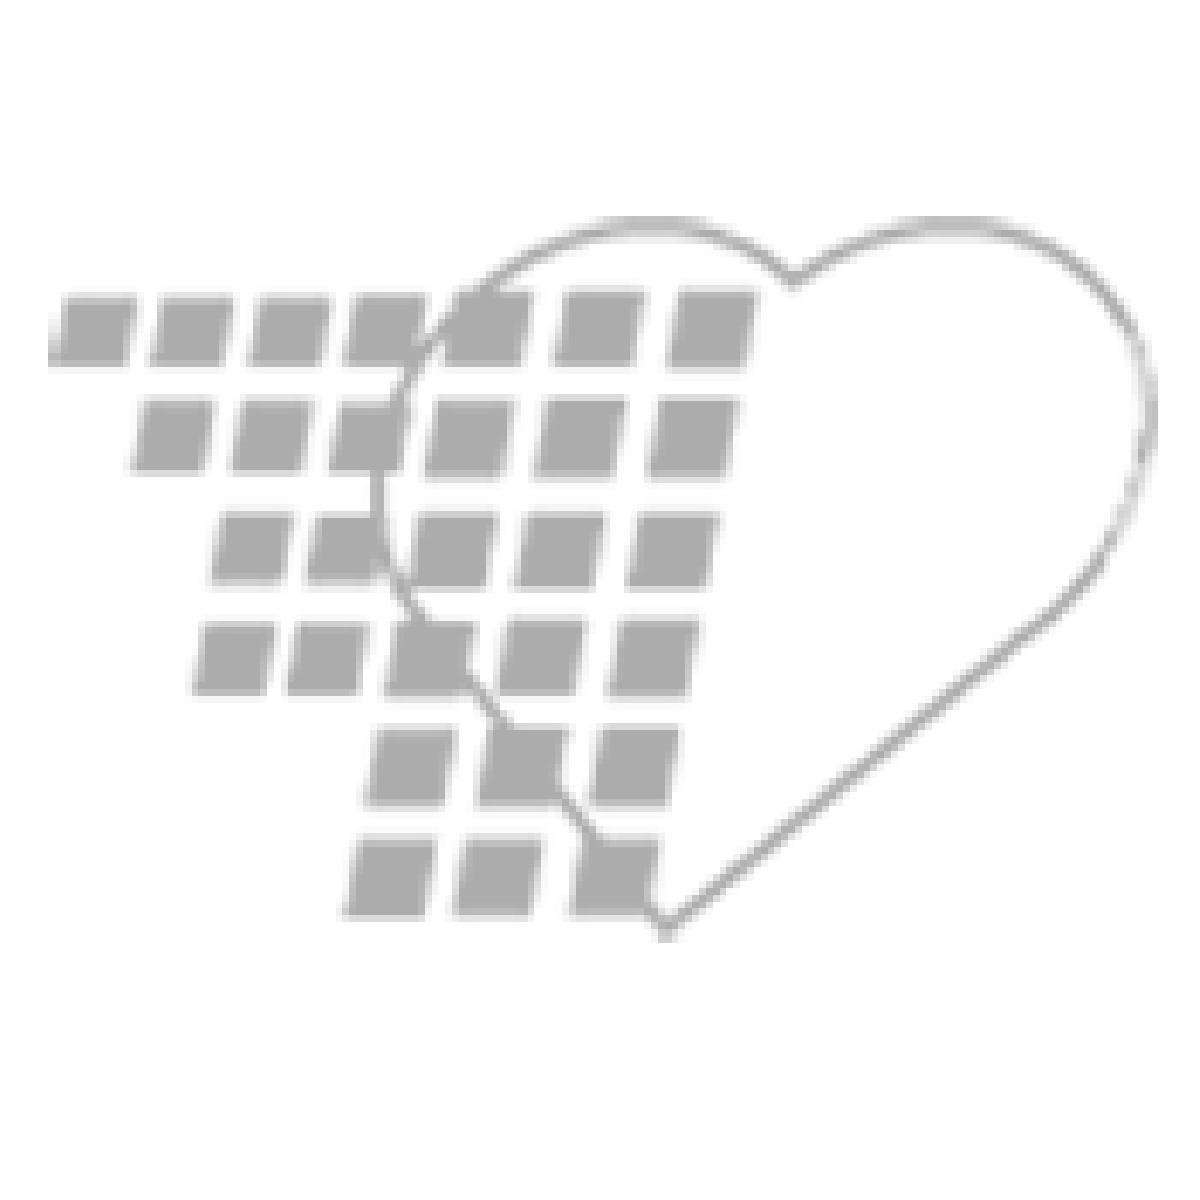 "06-21-9821 Saf-T Wing Blood Collection Set 21G x 3/4"""